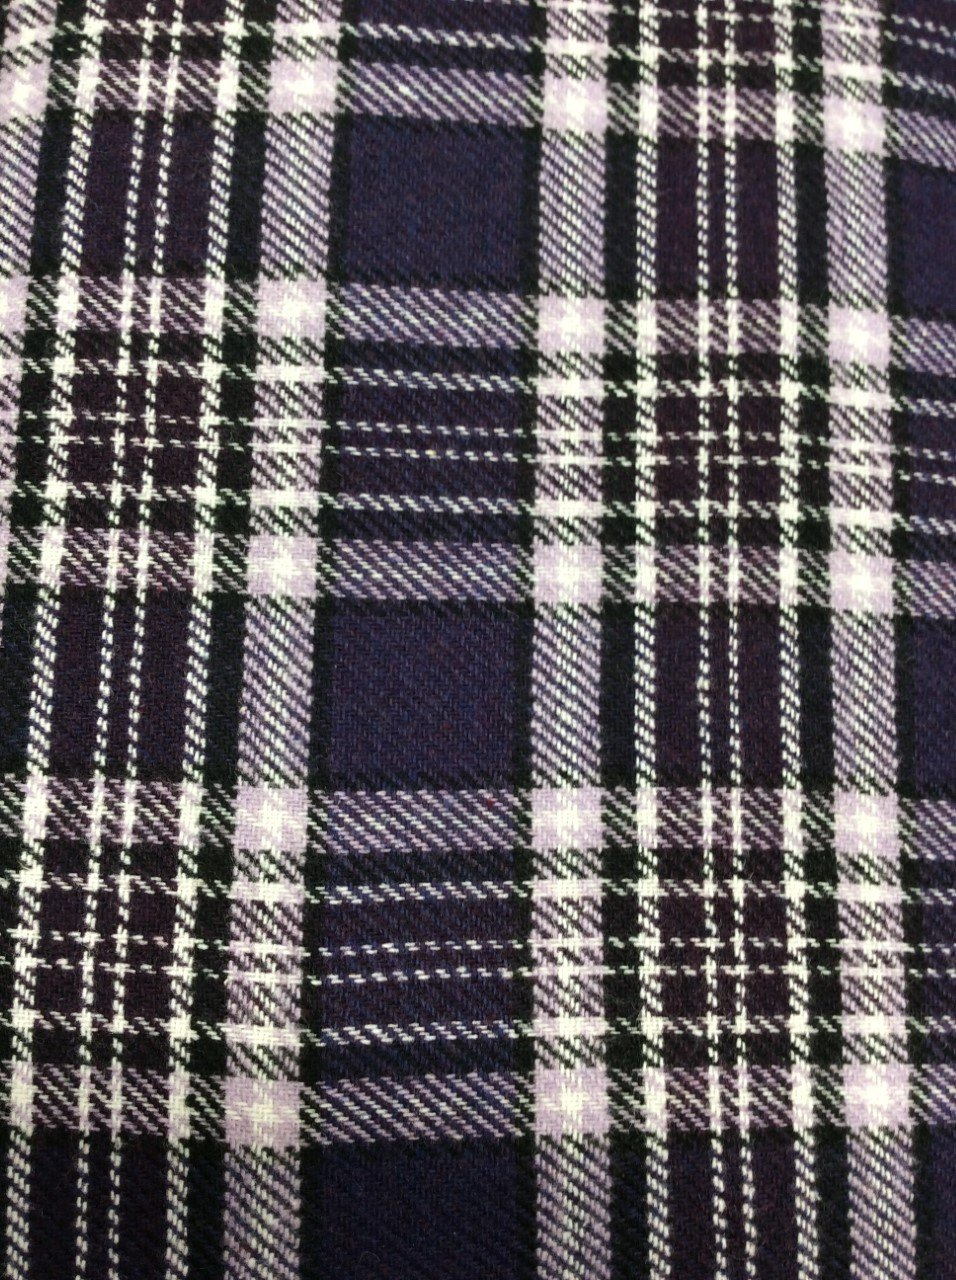 Purple Black and White Plaid Wool Coating